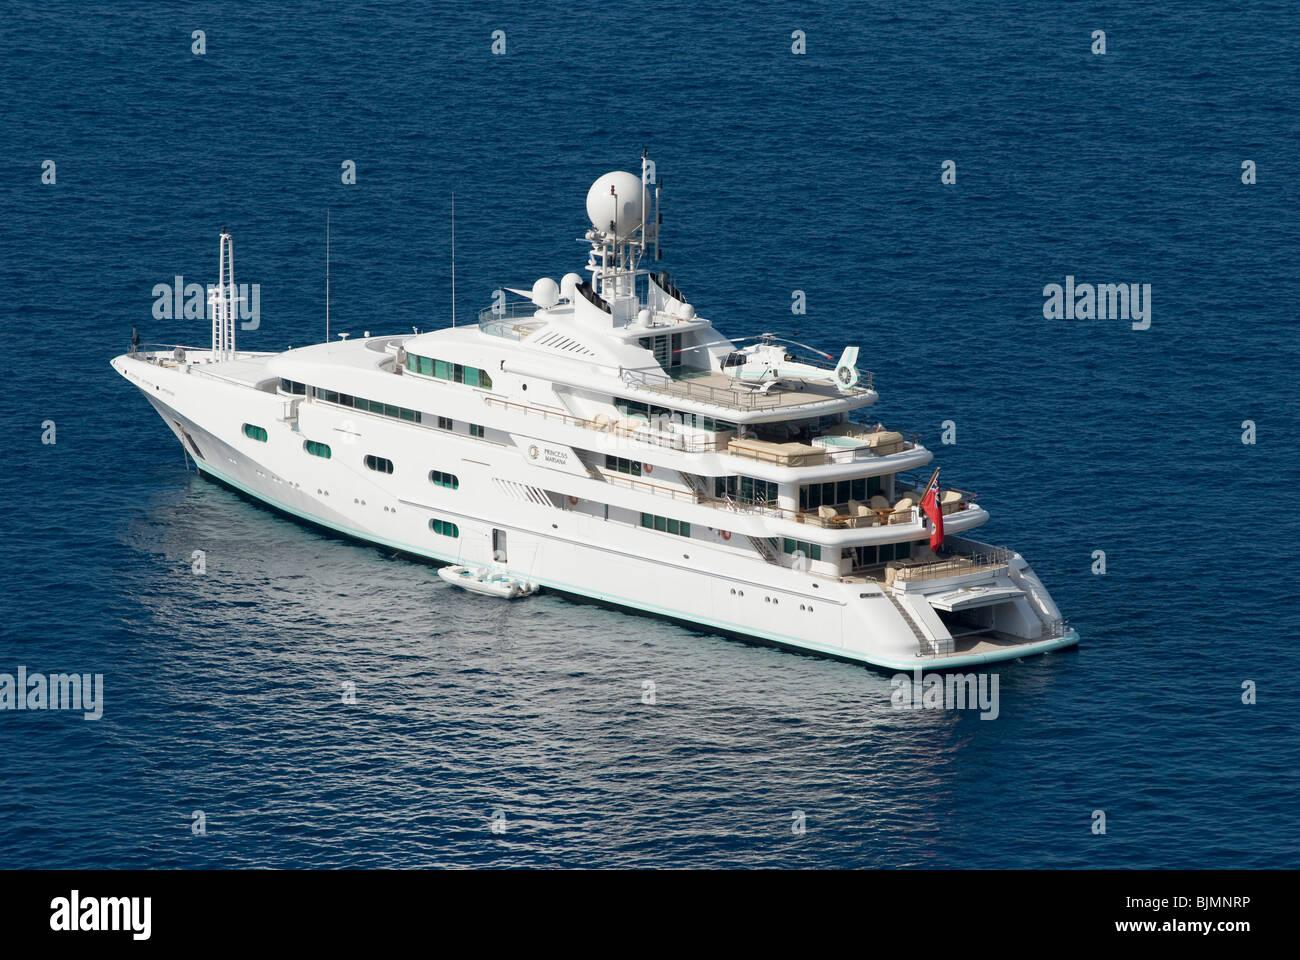 Italien, Kampanien, Insel Capri, Luxusjacht am Meer   Italy, Campania, Isle of Capri, luxury yacht - Stock Image